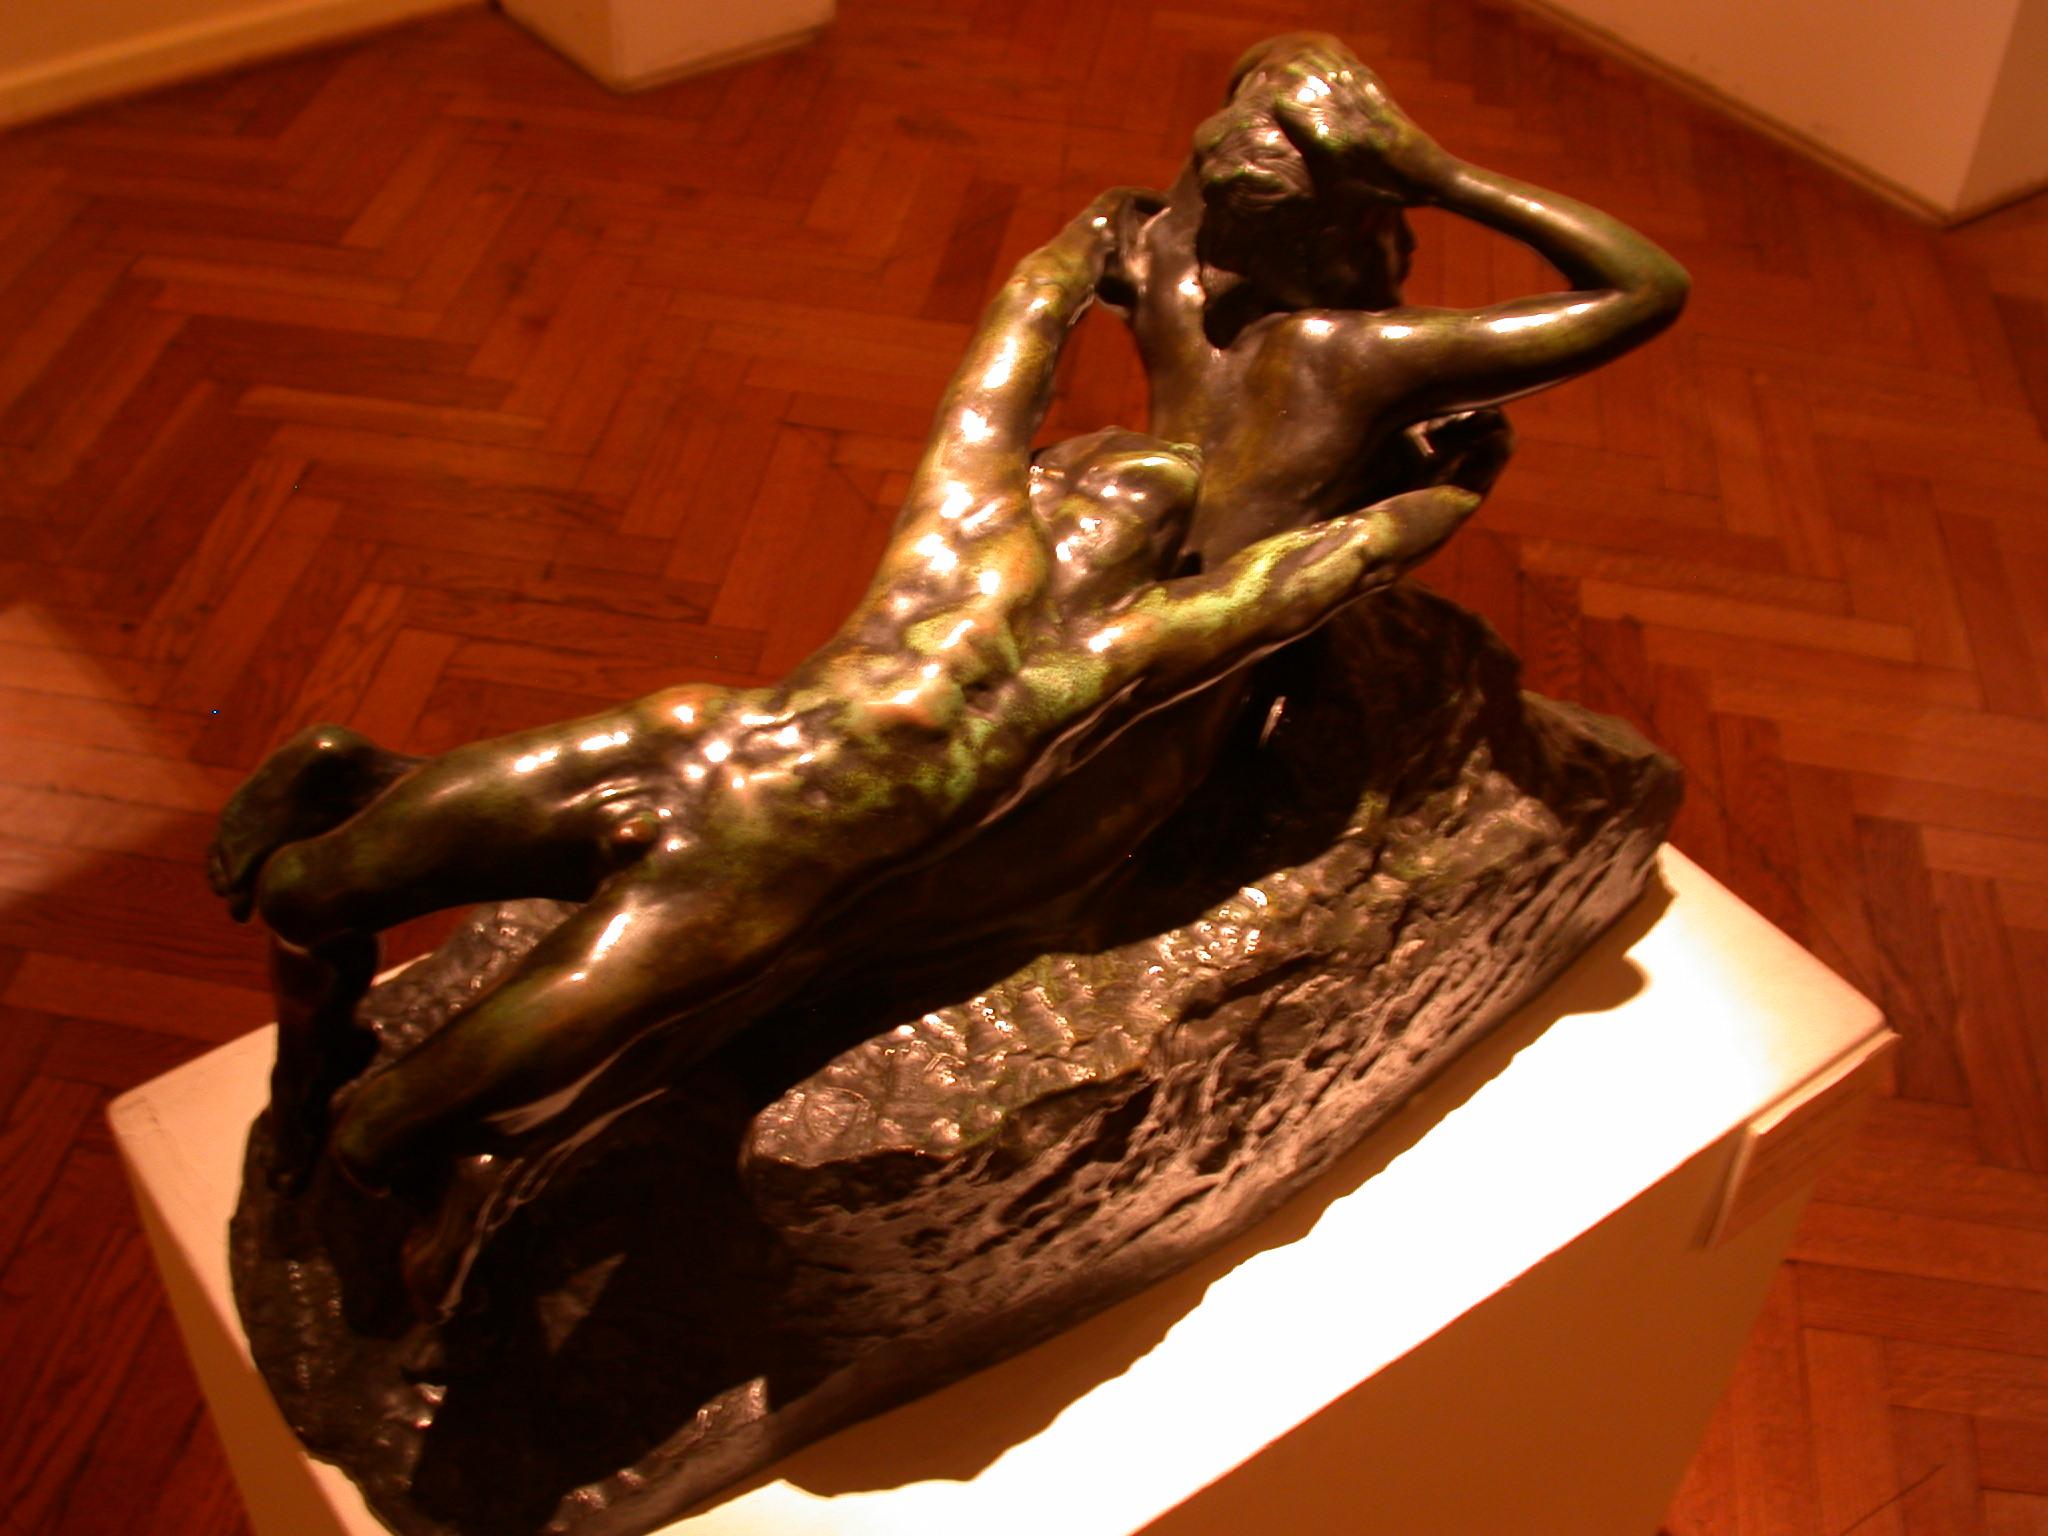 Amor Fugit, Rene Francois Auguste Rodin, Museo de las Bellas Artes, Buenos Aires, Argentina